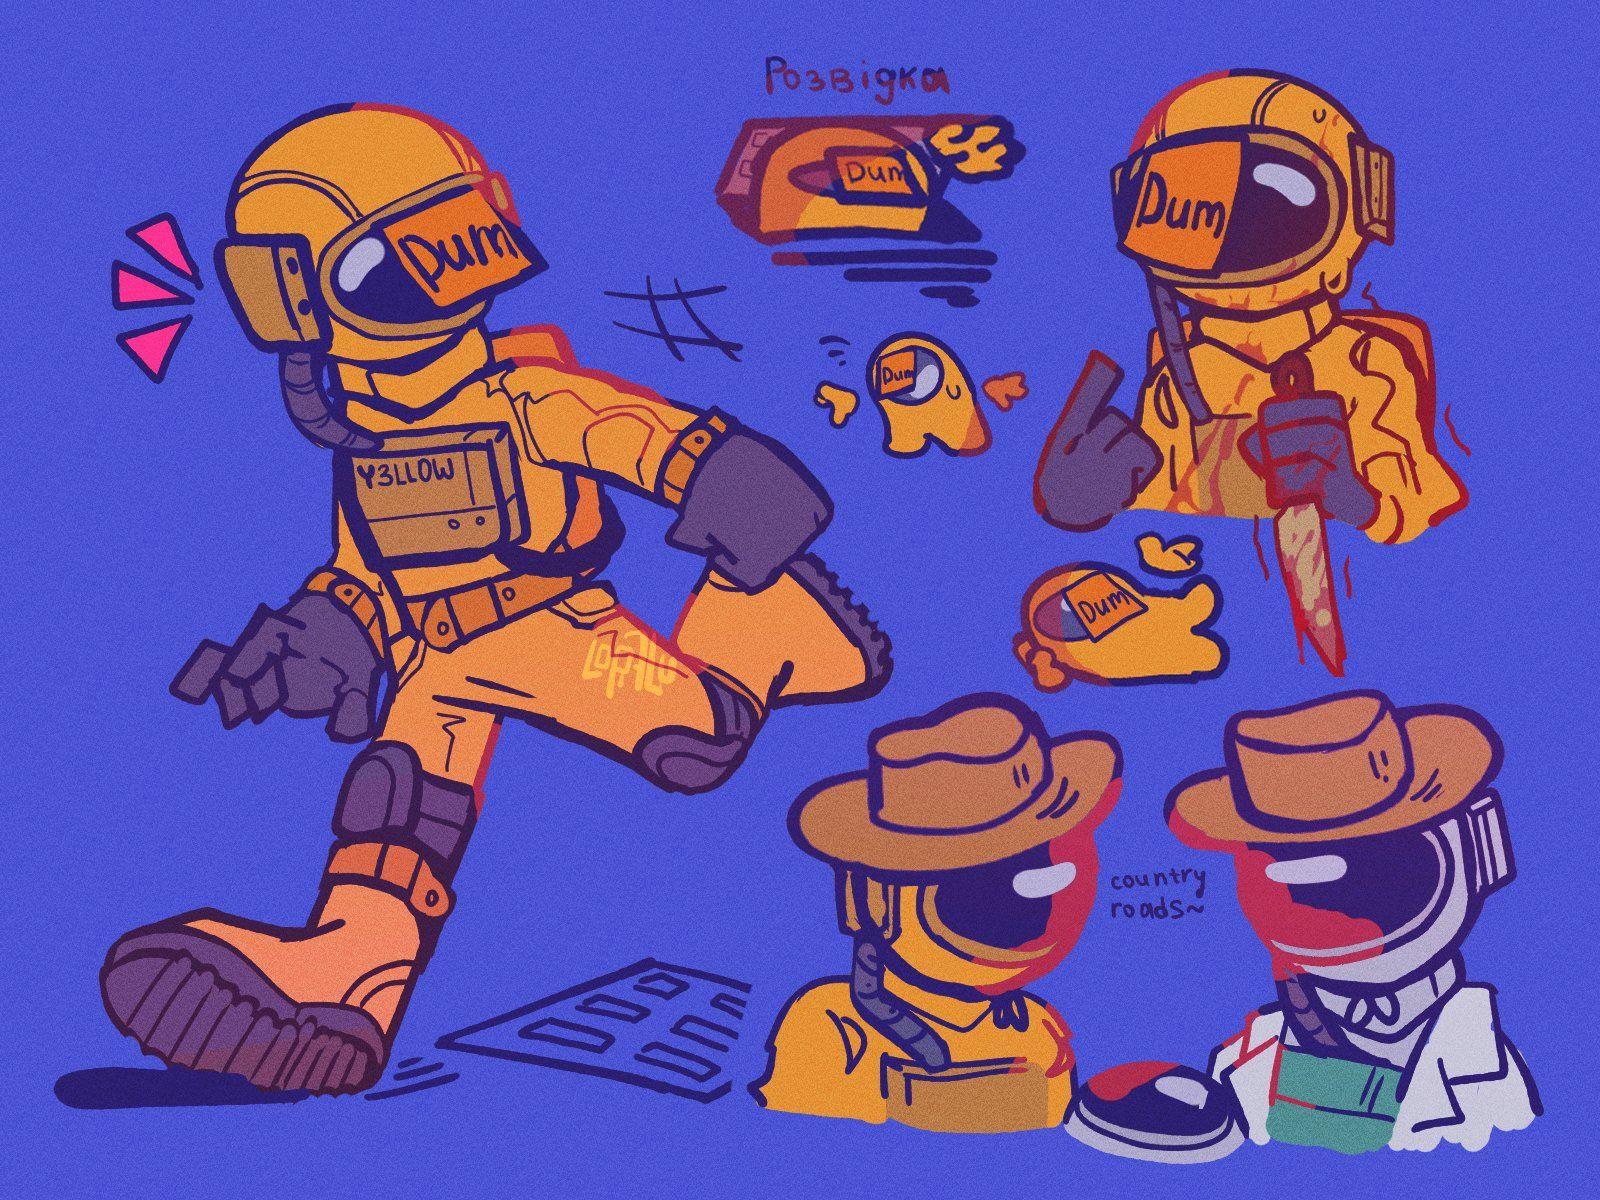 Pin By Kika Kurka On Drawings I Like In 2020 Cartoon Art Cute Art Character Art